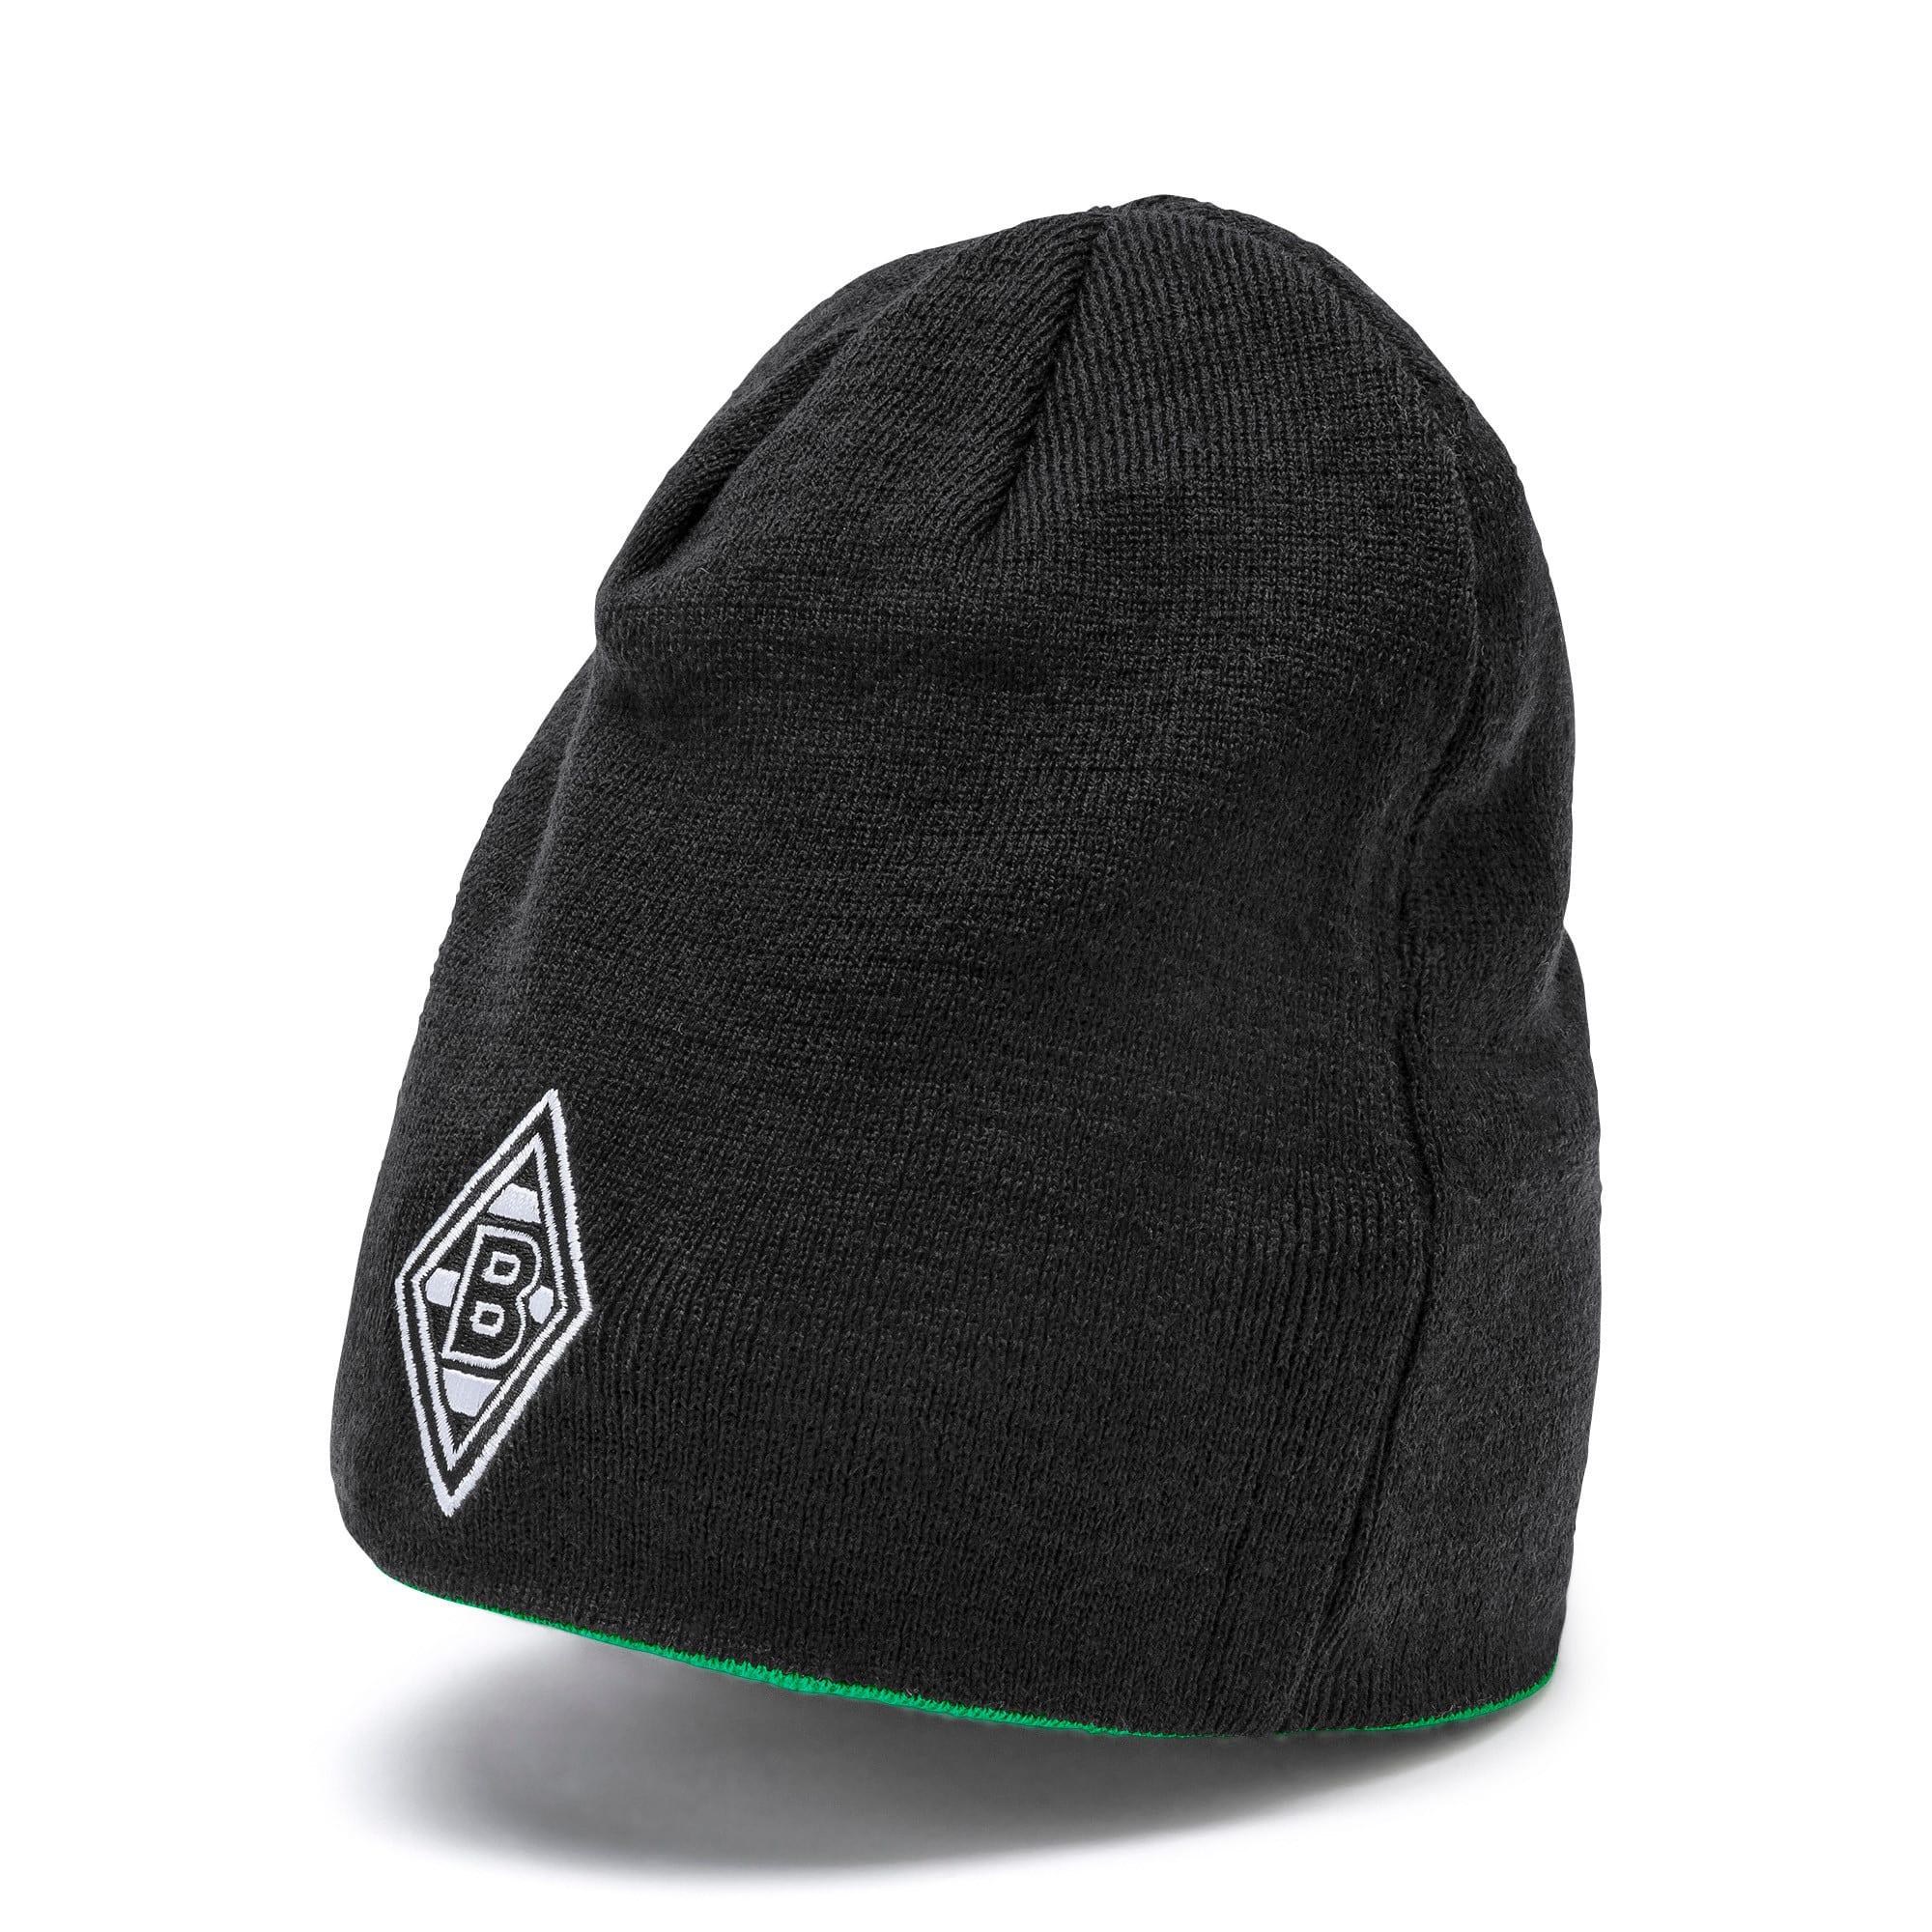 Thumbnail 1 of Borussia Mönchengladbach Reversible Beanie, Puma Black-Bright Green, medium